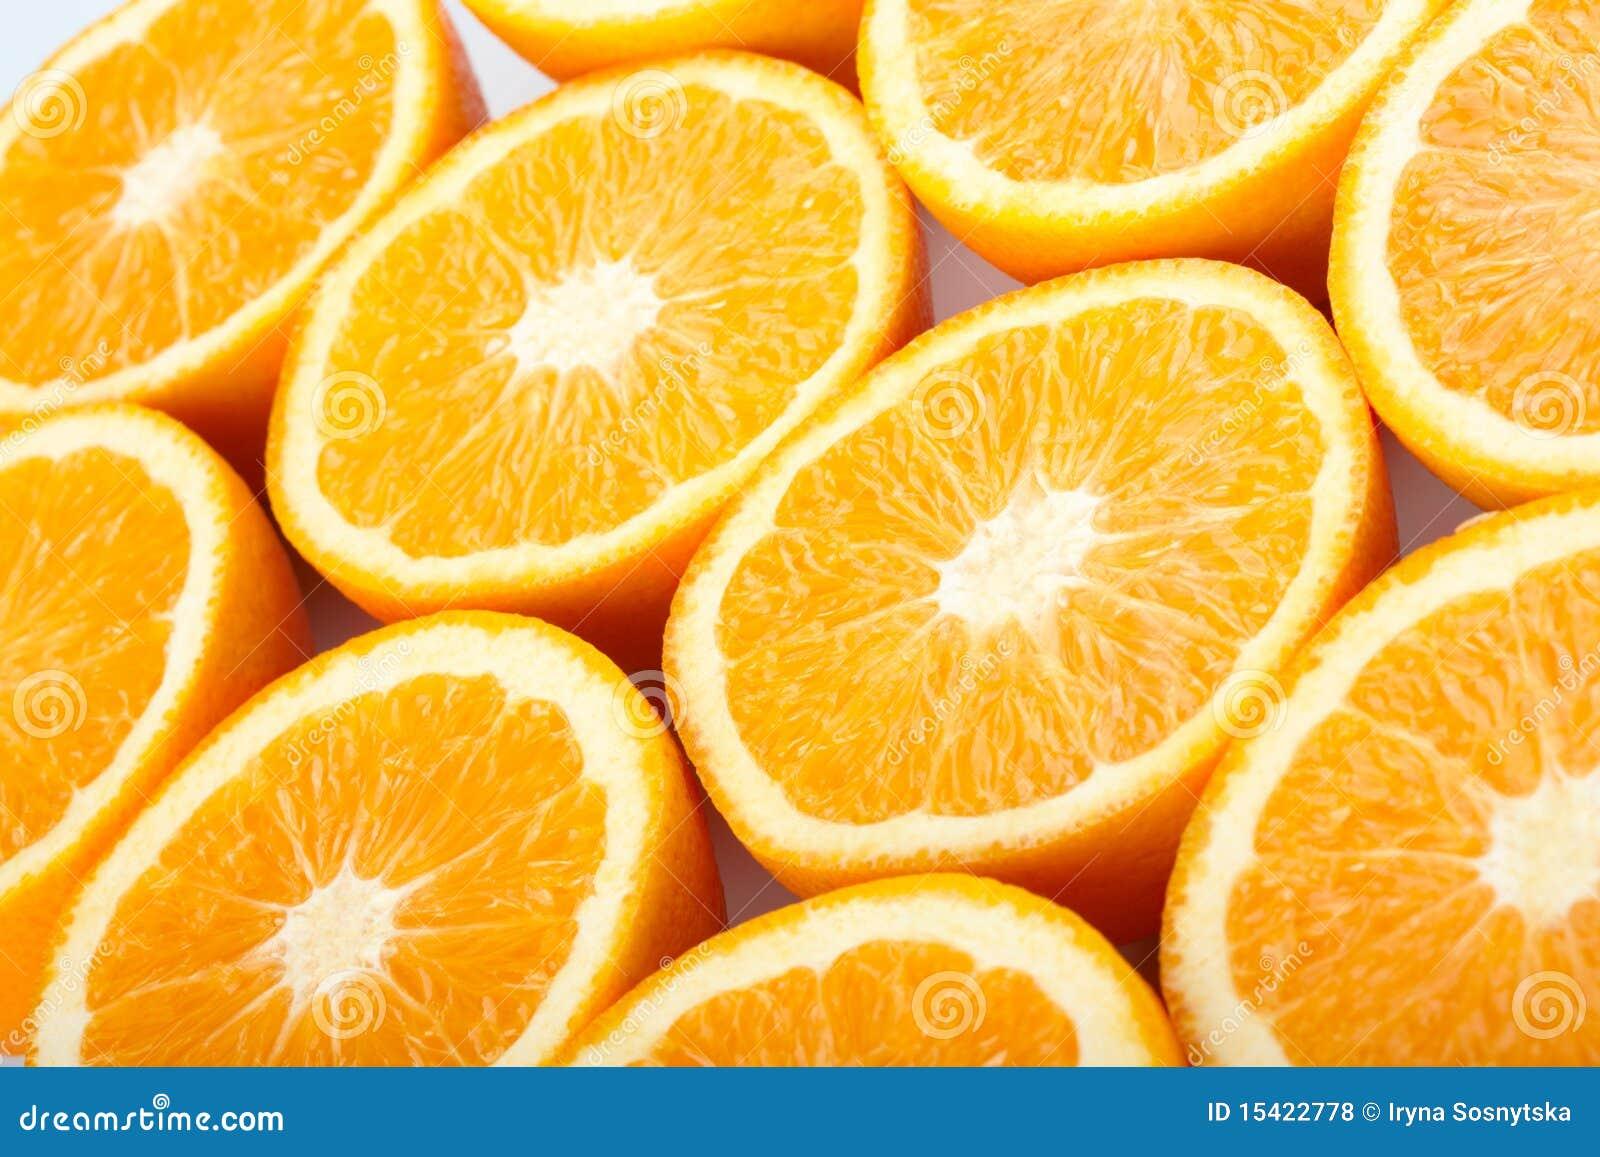 Orange halves